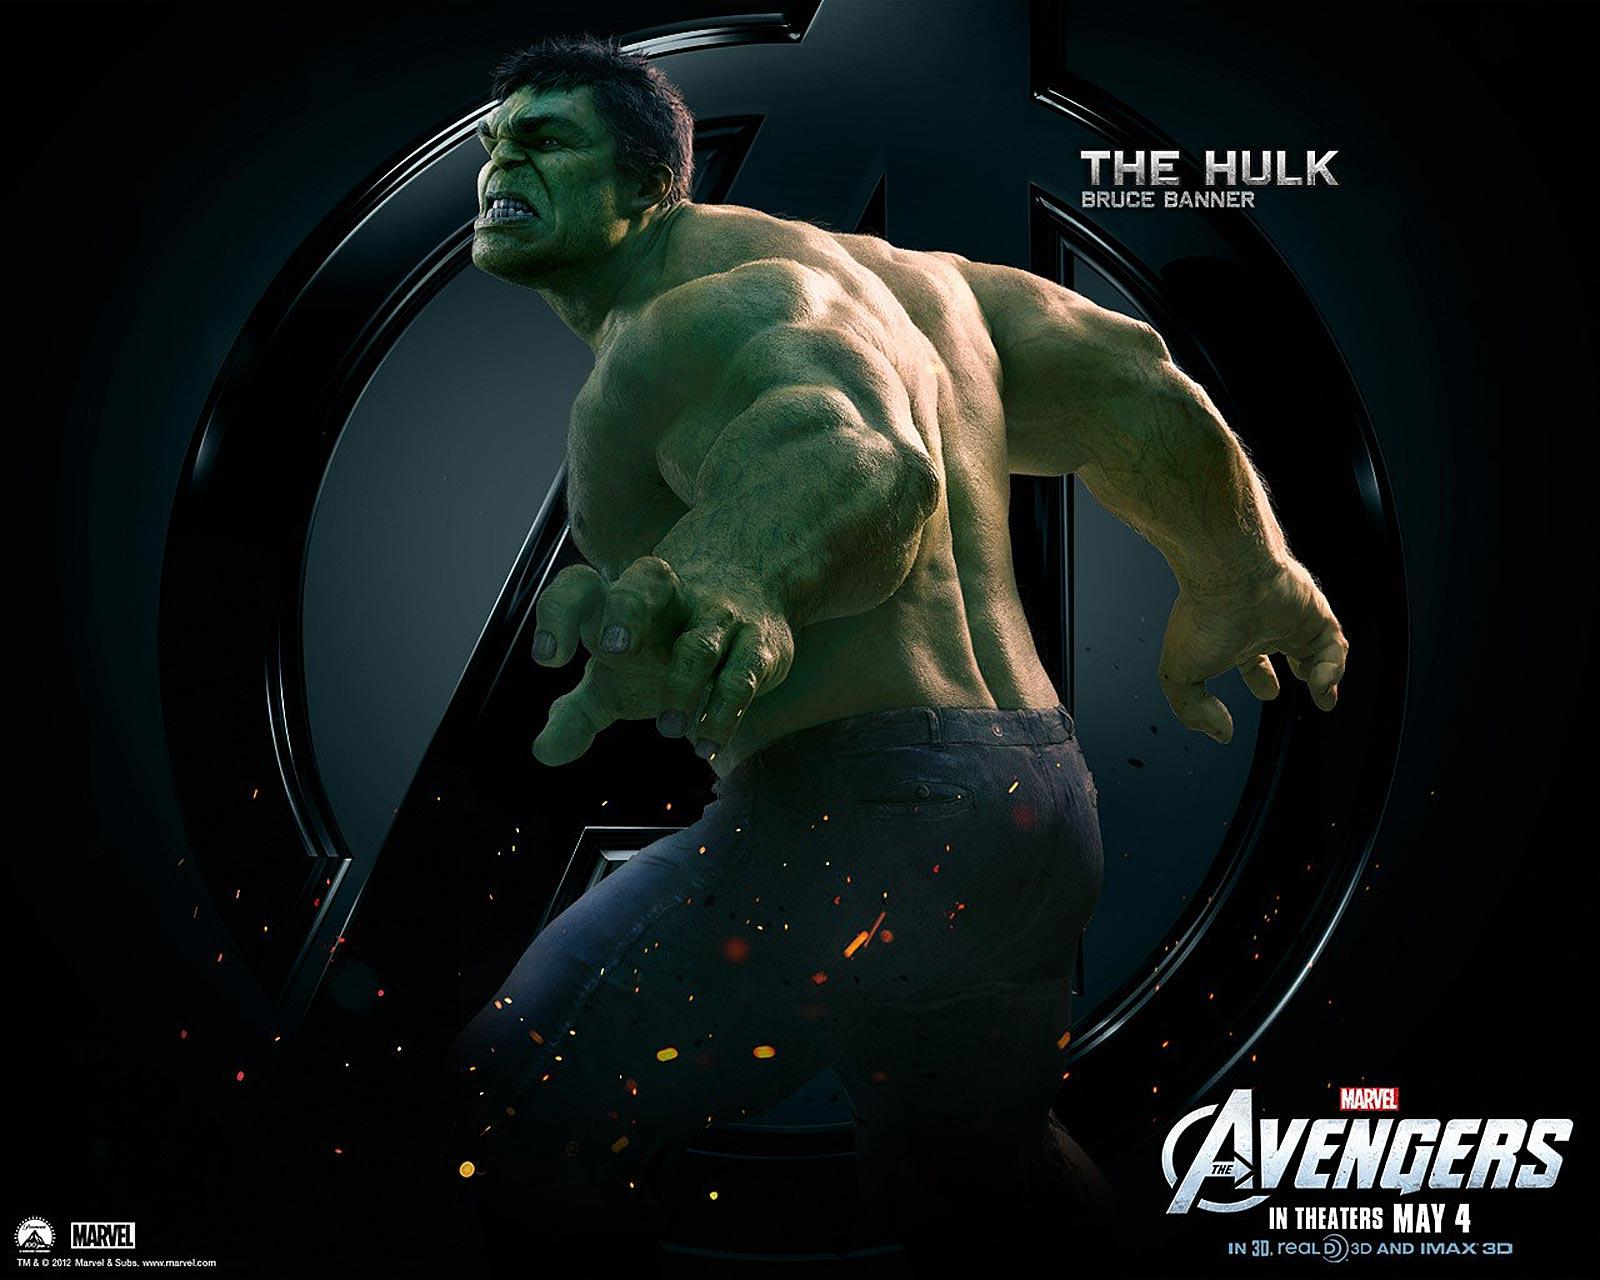 Dr bruce banner images hulk hd wallpaper and background - Incredible hulk wallpaper avengers ...